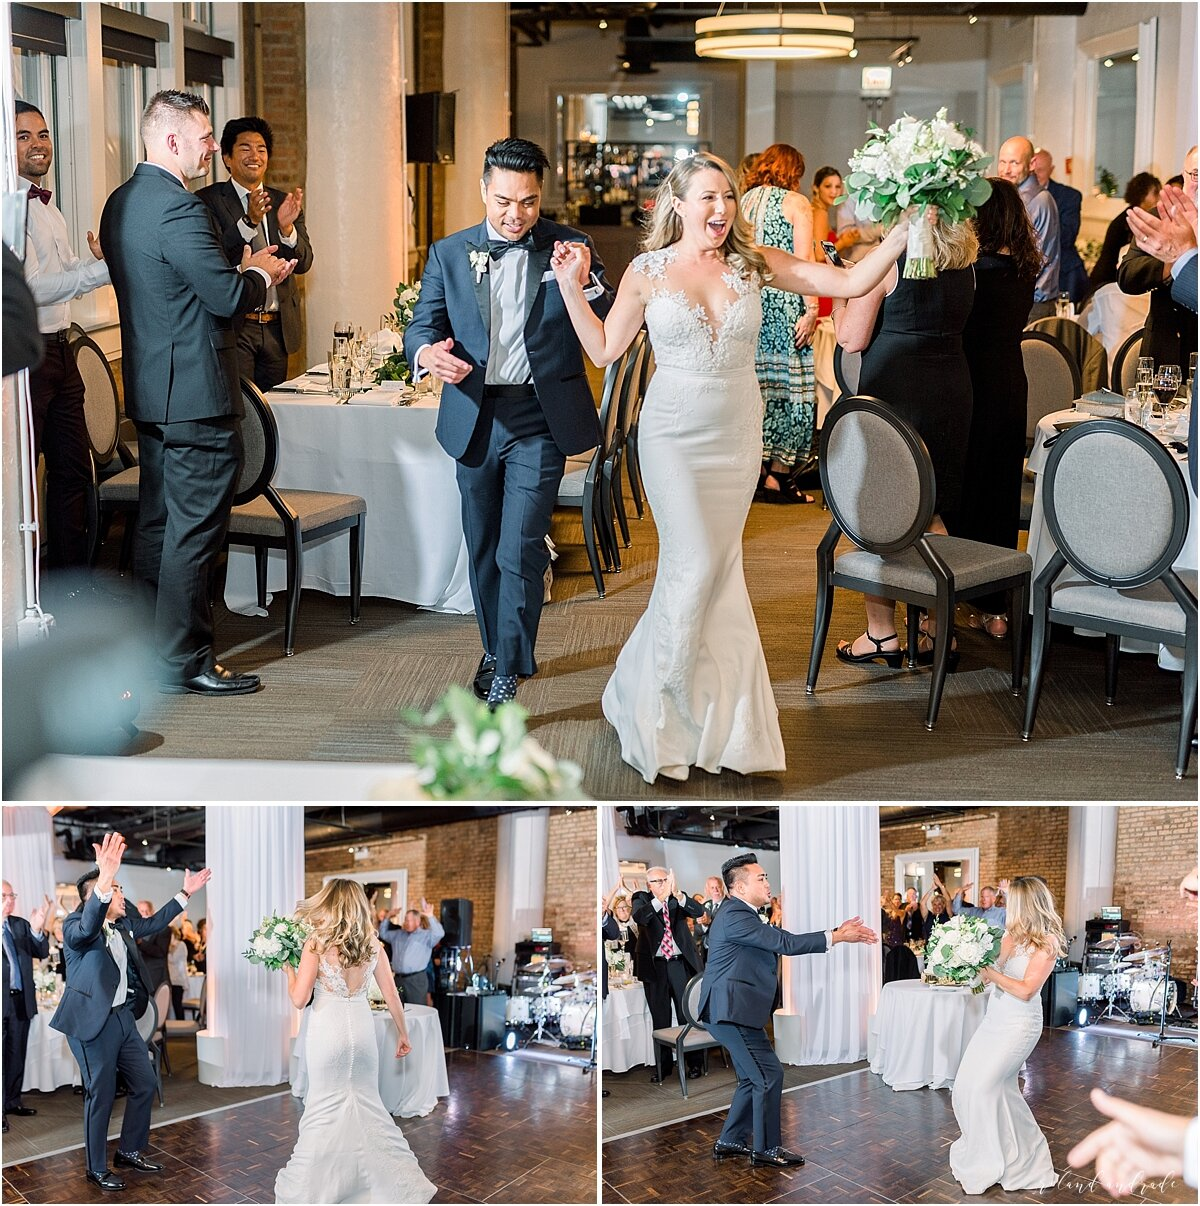 River Roast Wedding + Light and Airy Wedding Photographer Chicago + renaissance Hotel Wedding Photographer + Chicago Photography + Naperville Wedding Photographer + Chicago Engagement Photographer + Best Photographer In Chicago_0068.jpg